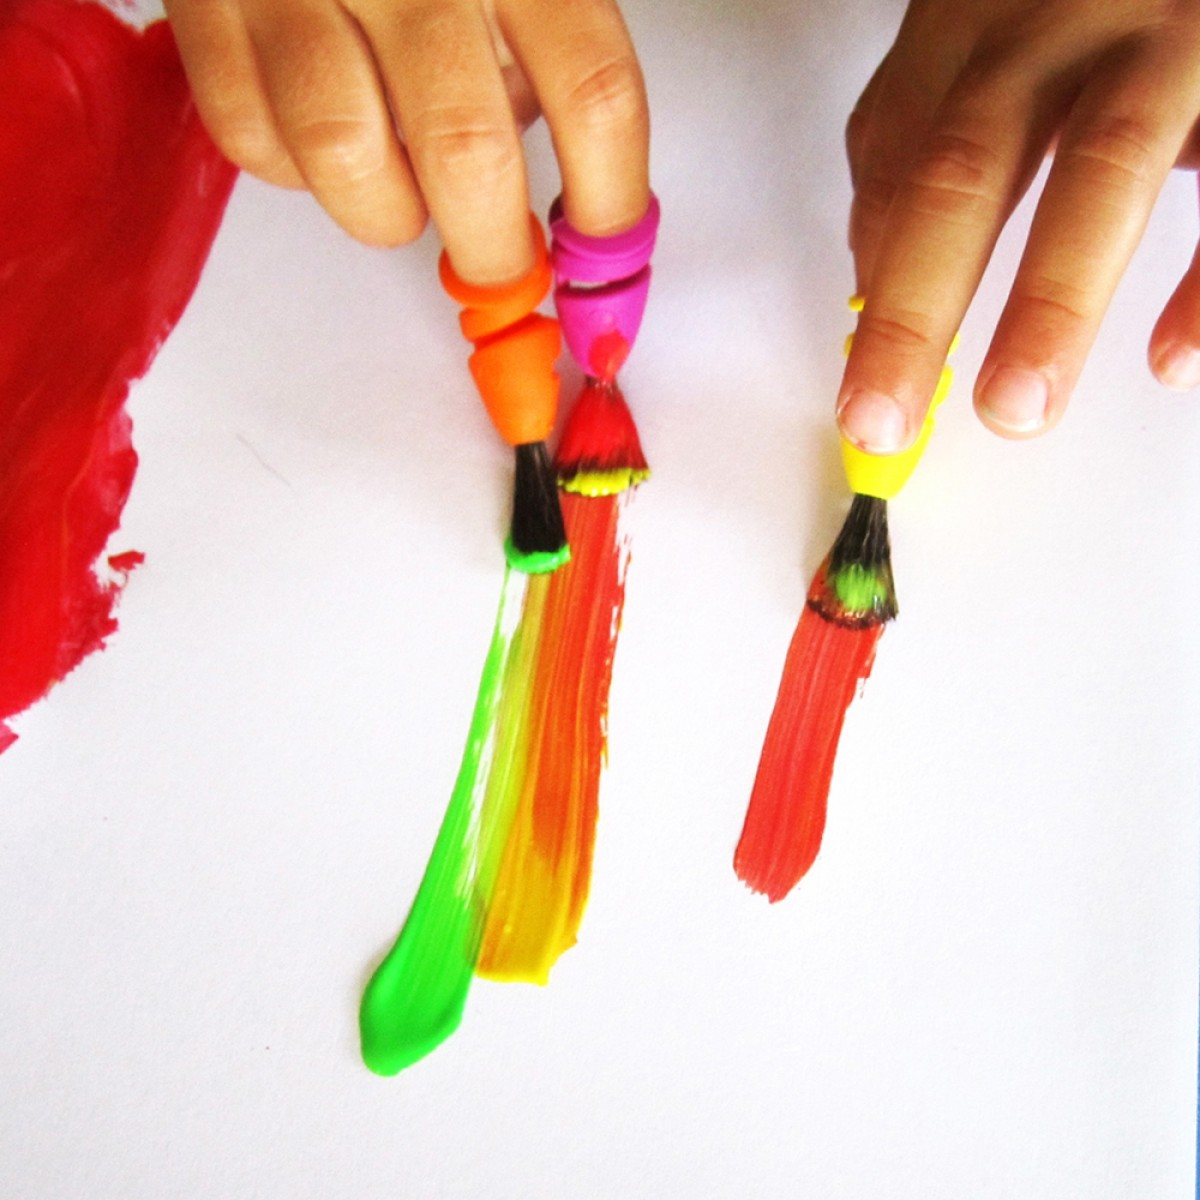 FINGERMAX - Fingerpinsel Schülerparty Set (14 Stück Fingermaxpinsel)